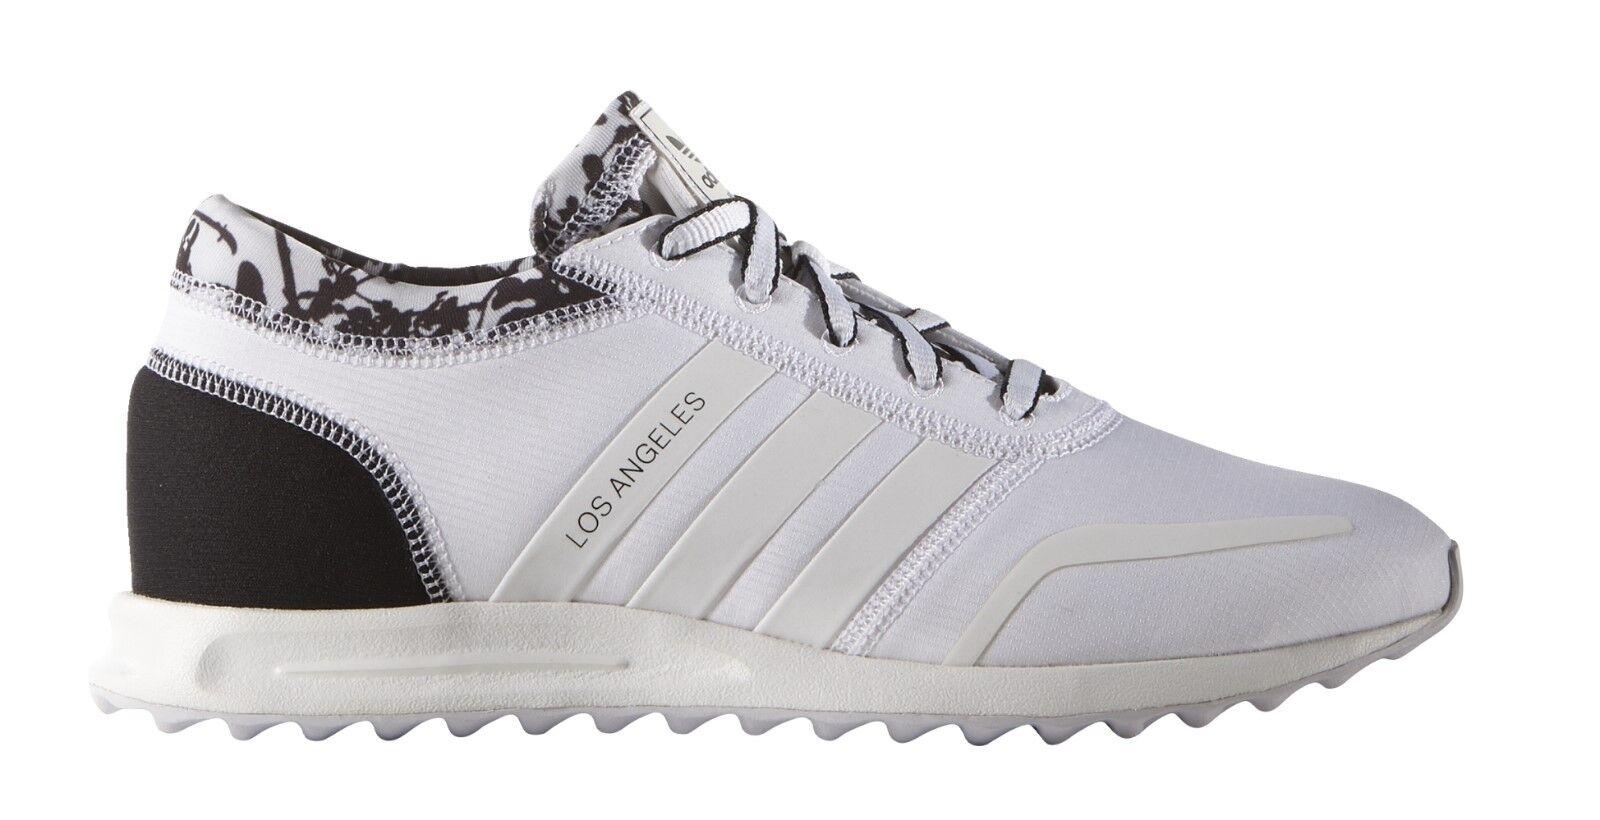 adidas Originals Turnschuhe LOS ANGELES S78915 FTWWHT/FTWWHT/CBLACK weiß neu zx